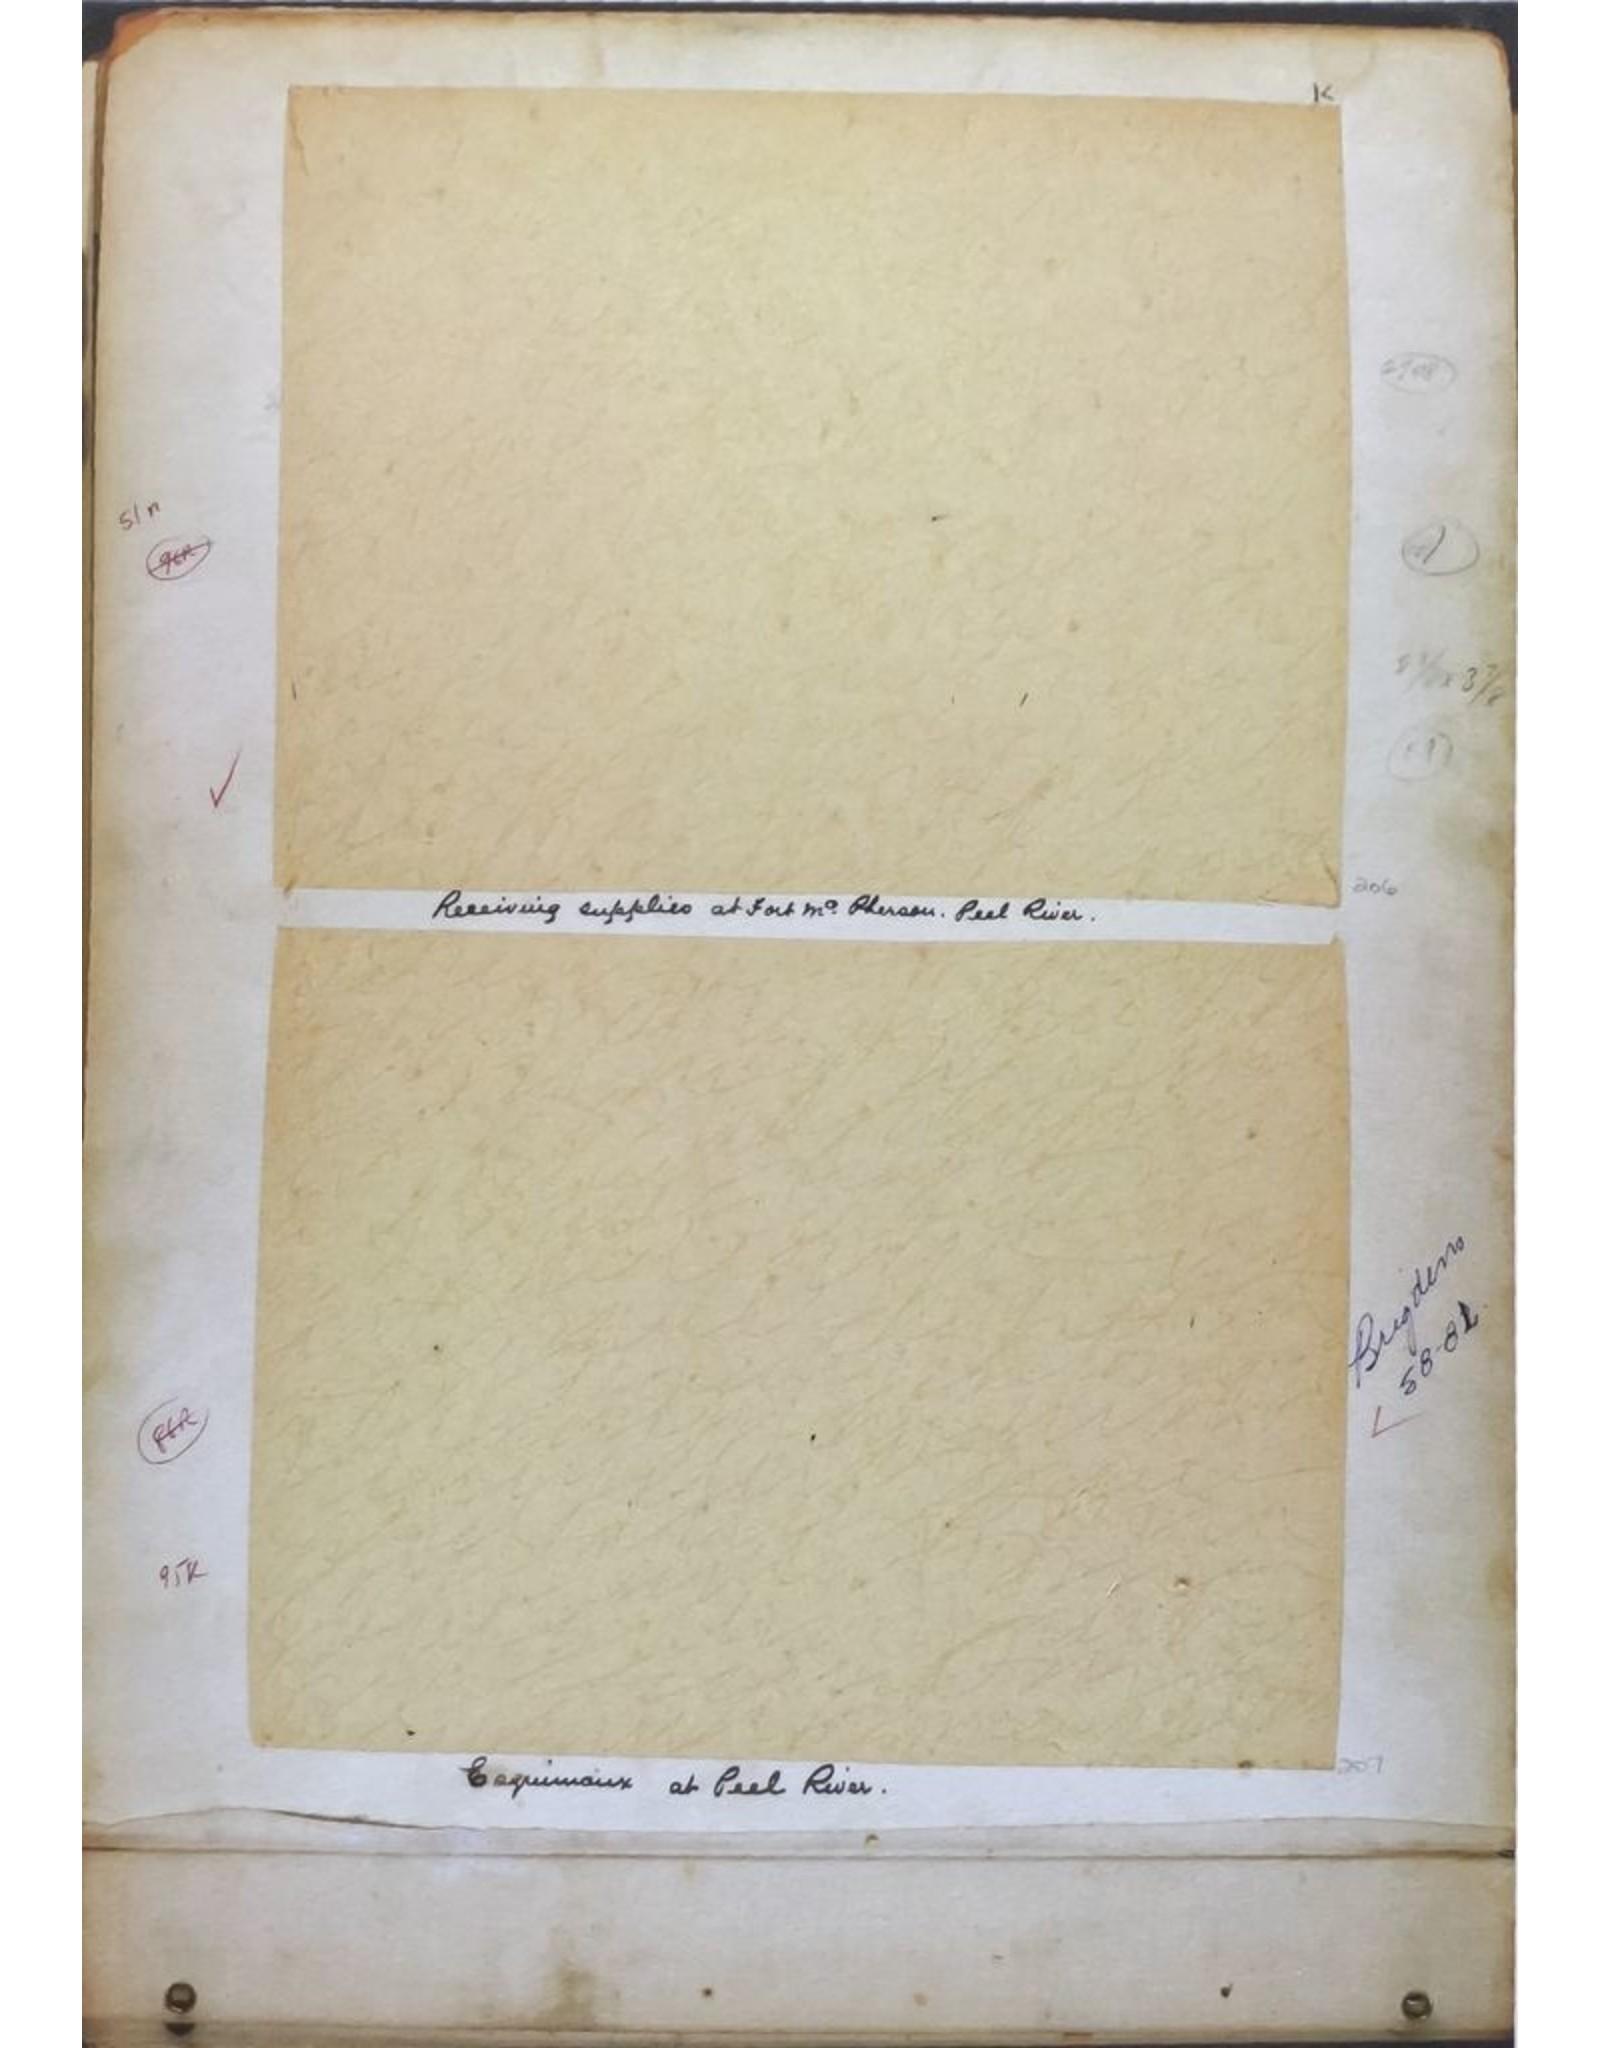 Crawley, Sarah untitled from the dead album, (206, 207) Sarah Crawley